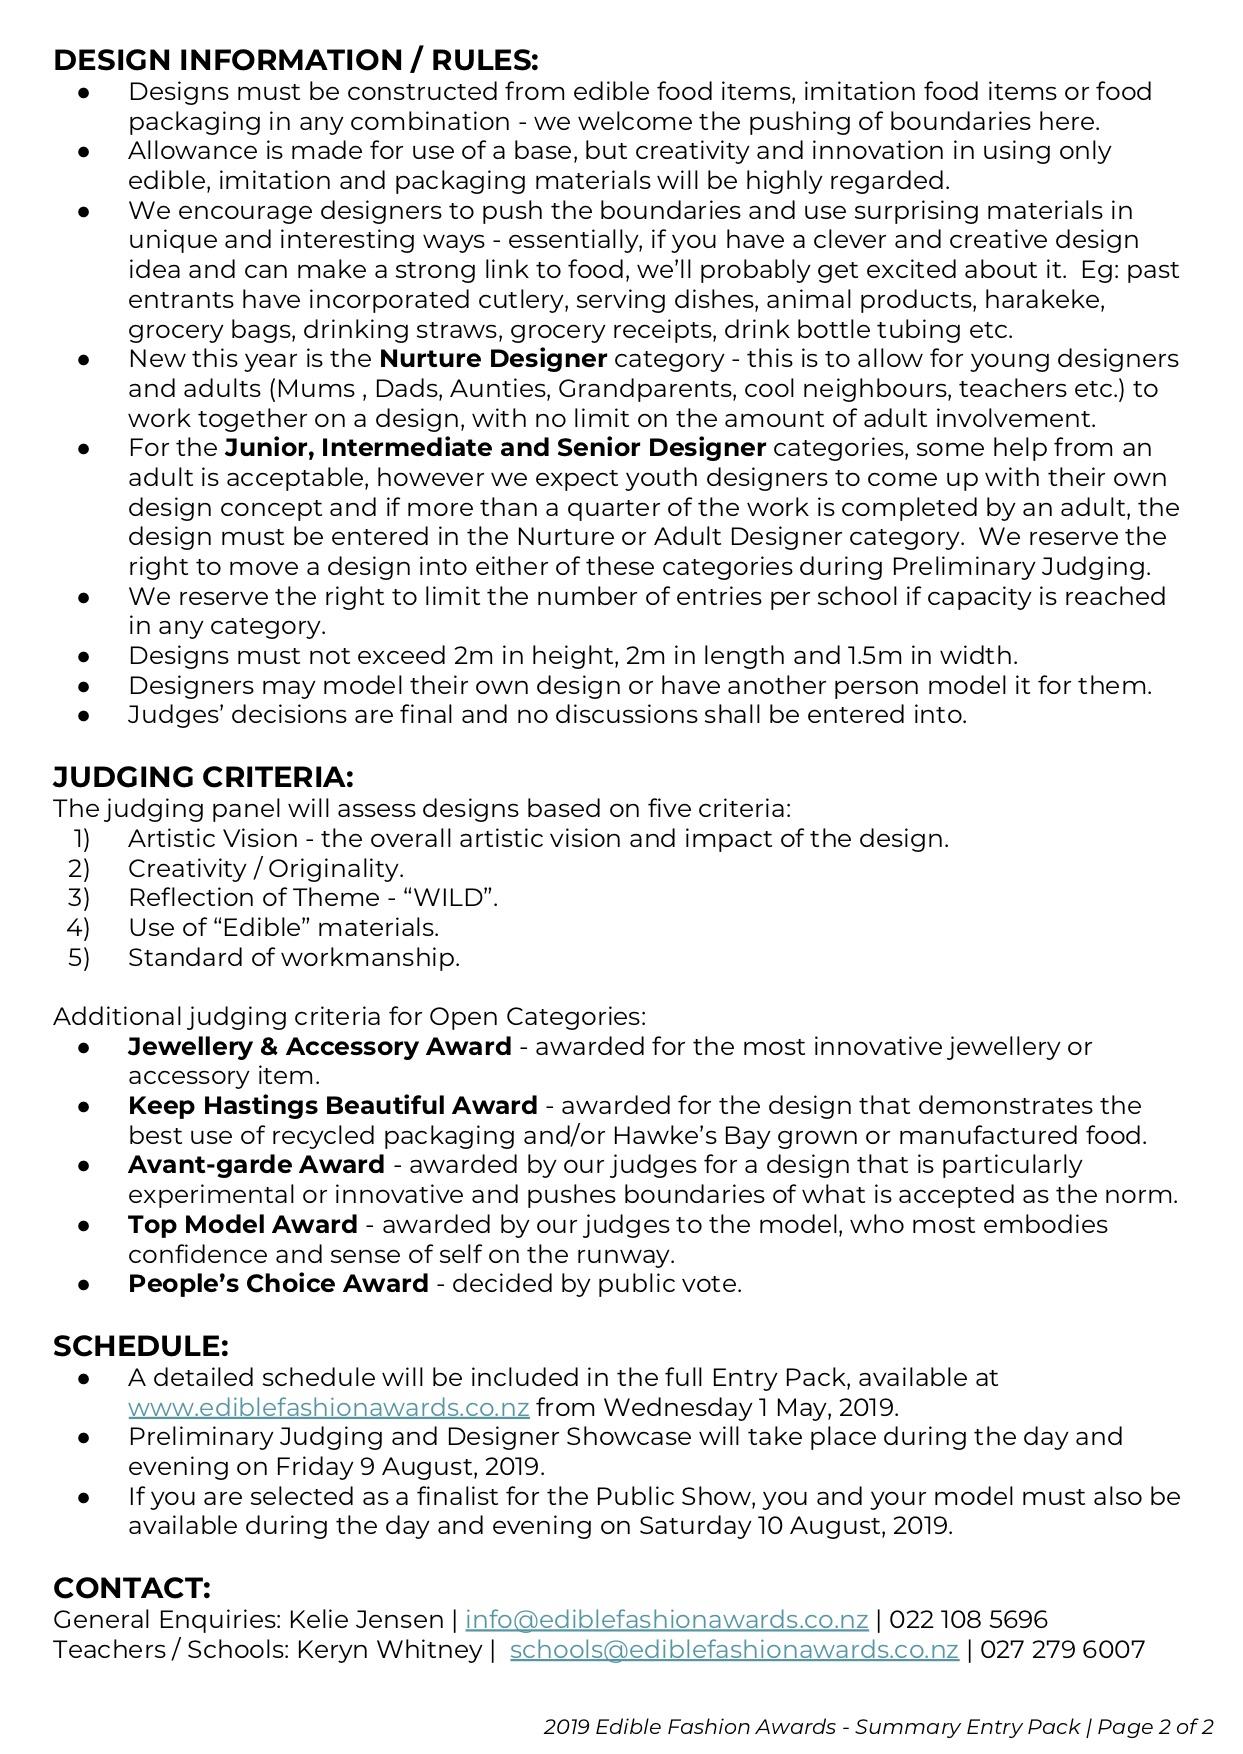 Edible 2019 Summary Sheet Pg 2.jpg